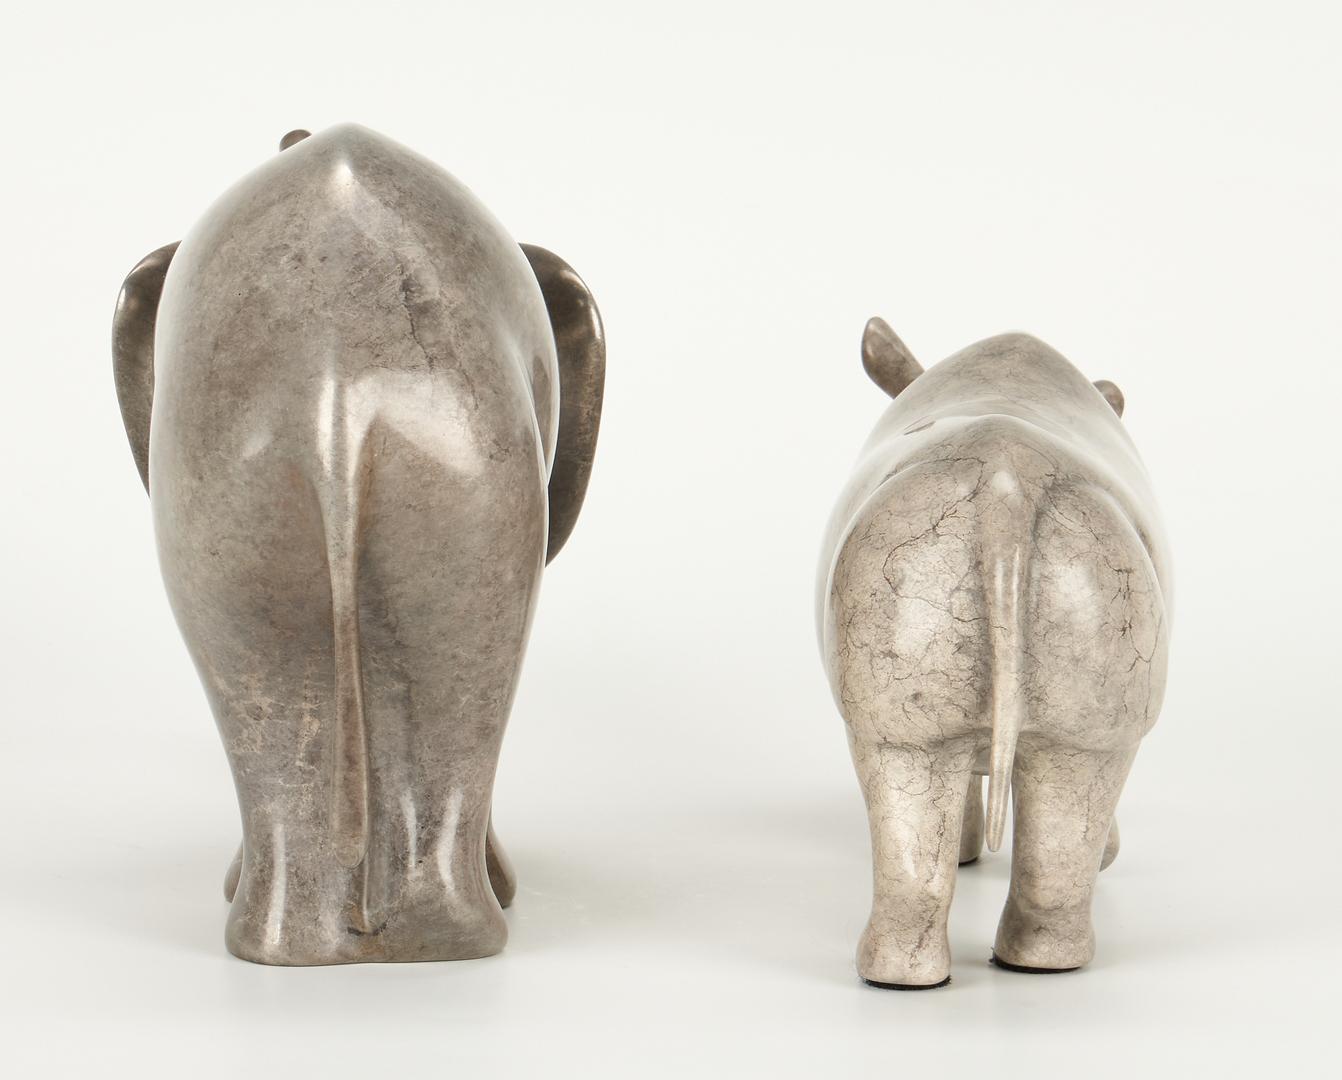 Lot 693: Loet Vanderveen Elephant and Rhino Figurines